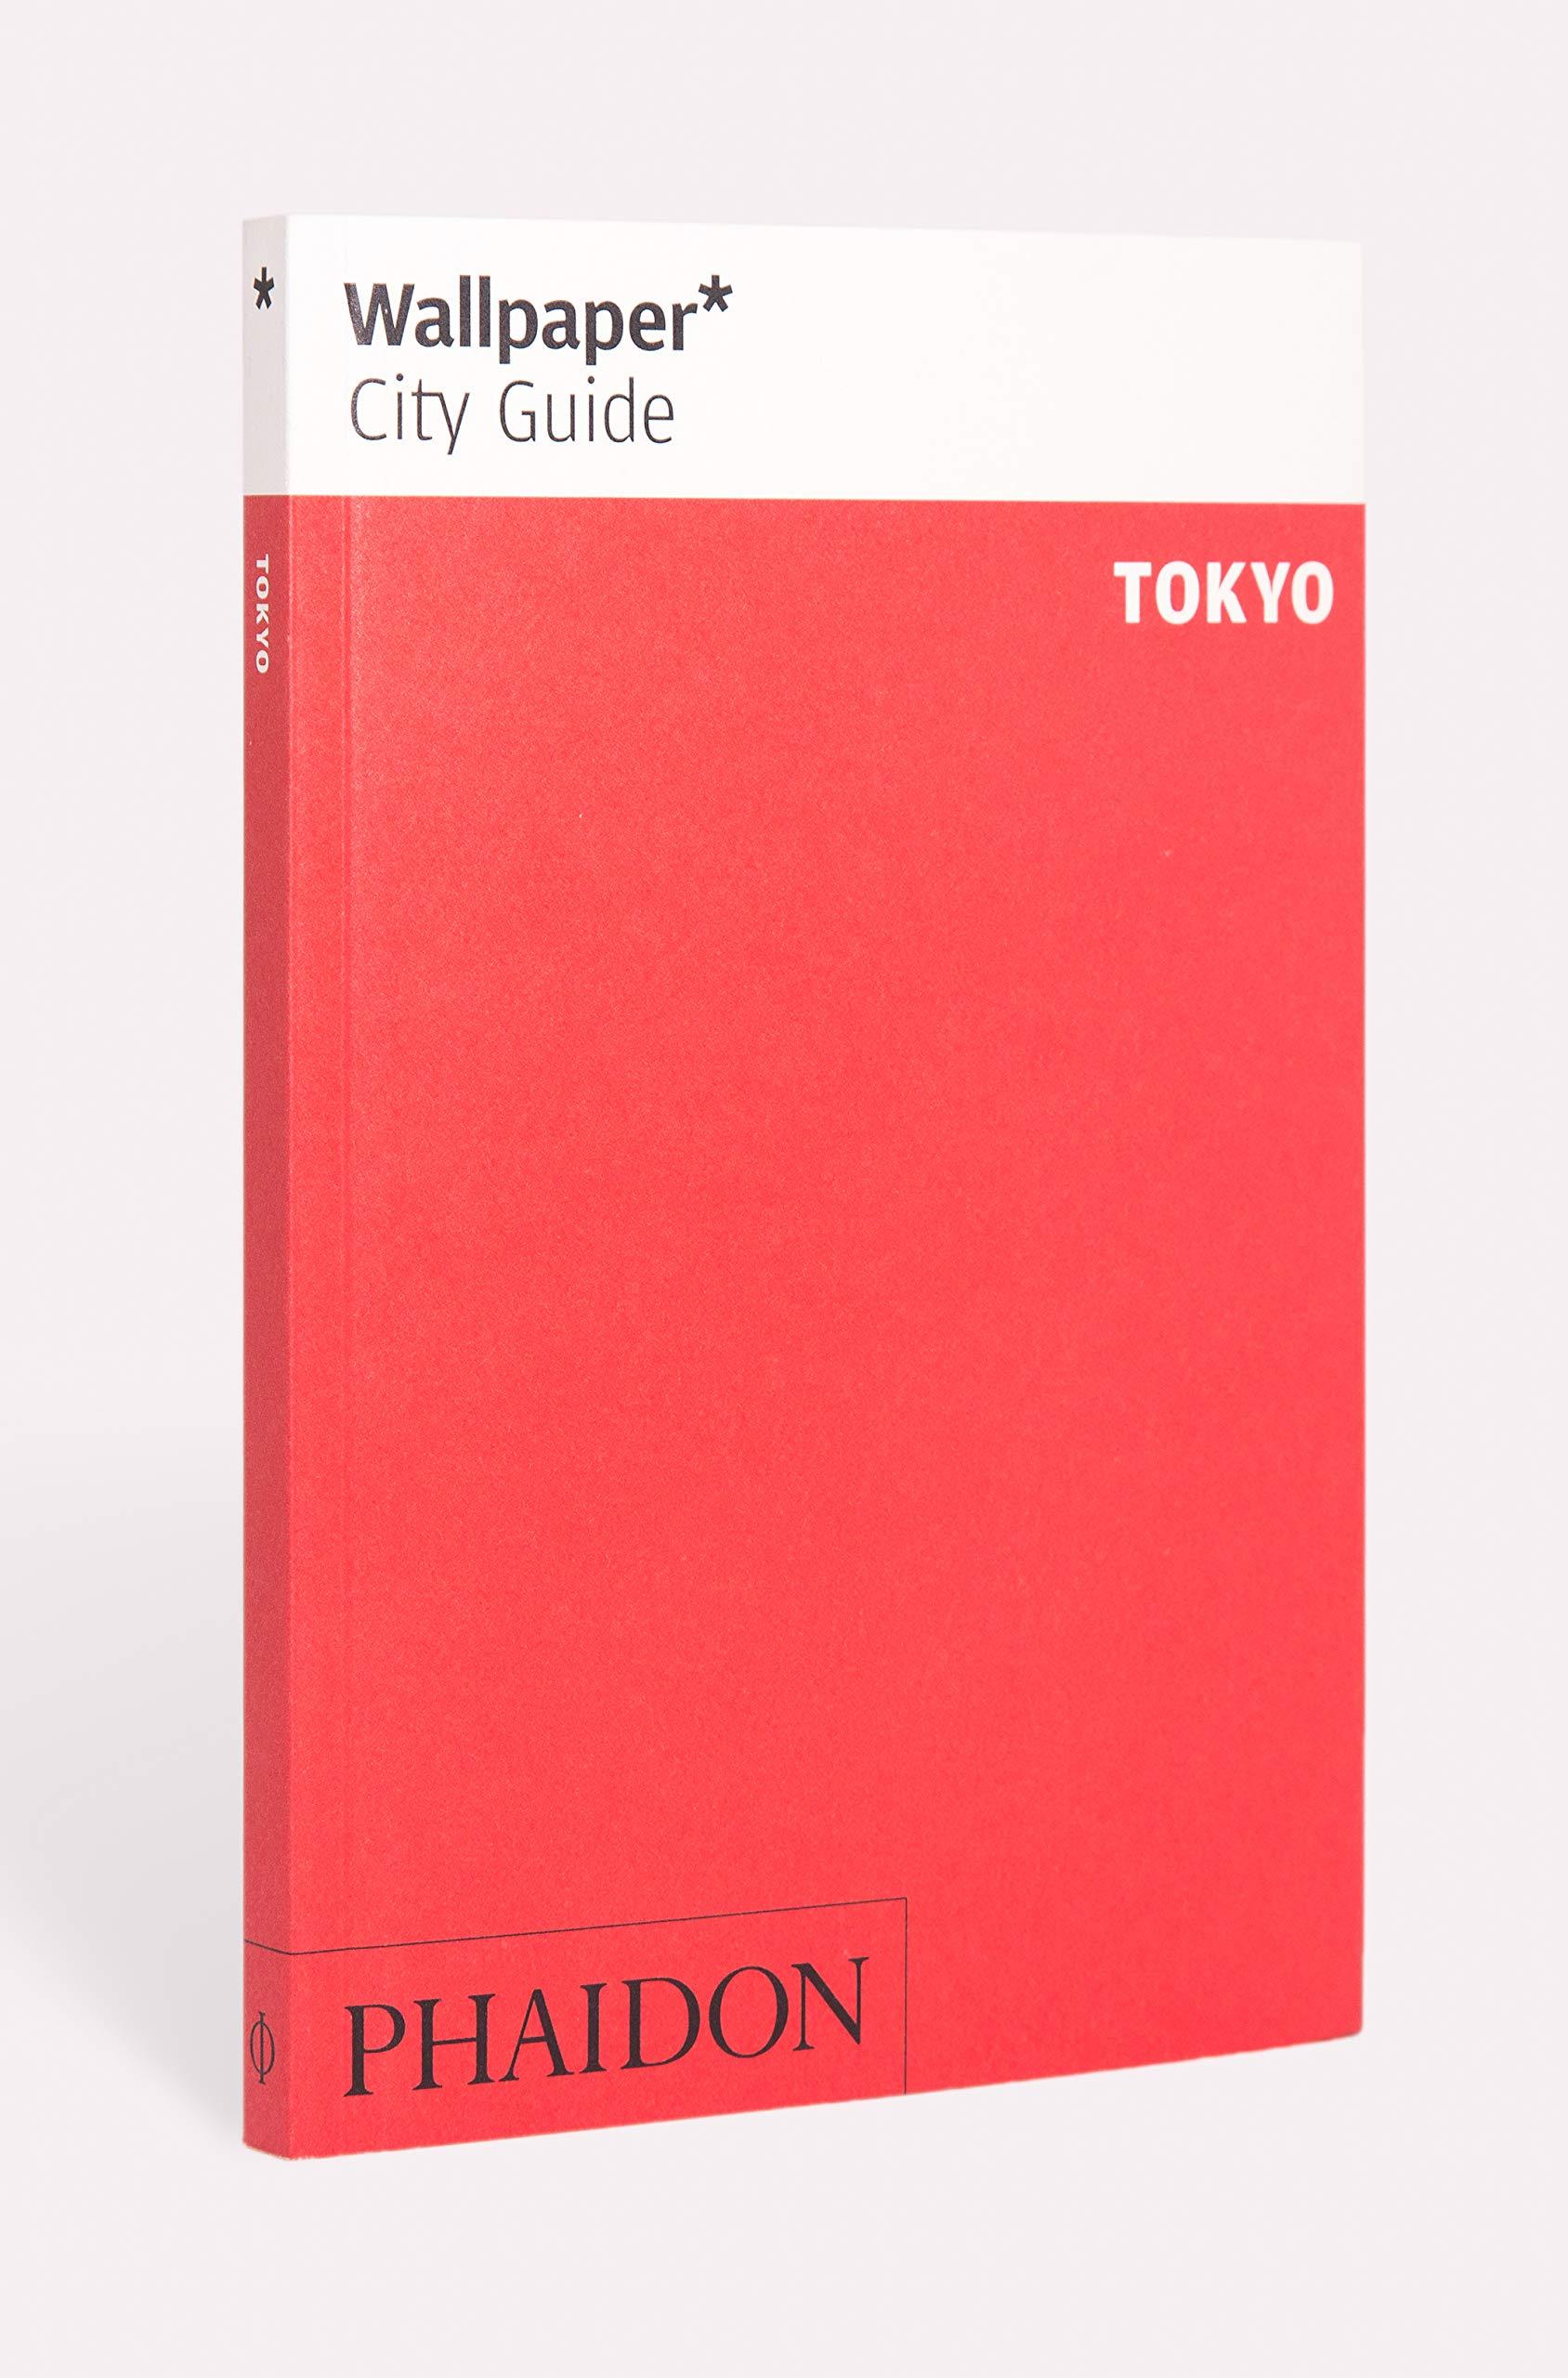 Asia Tokyo Wallpaper City Guide Tokyo Tokyo Books